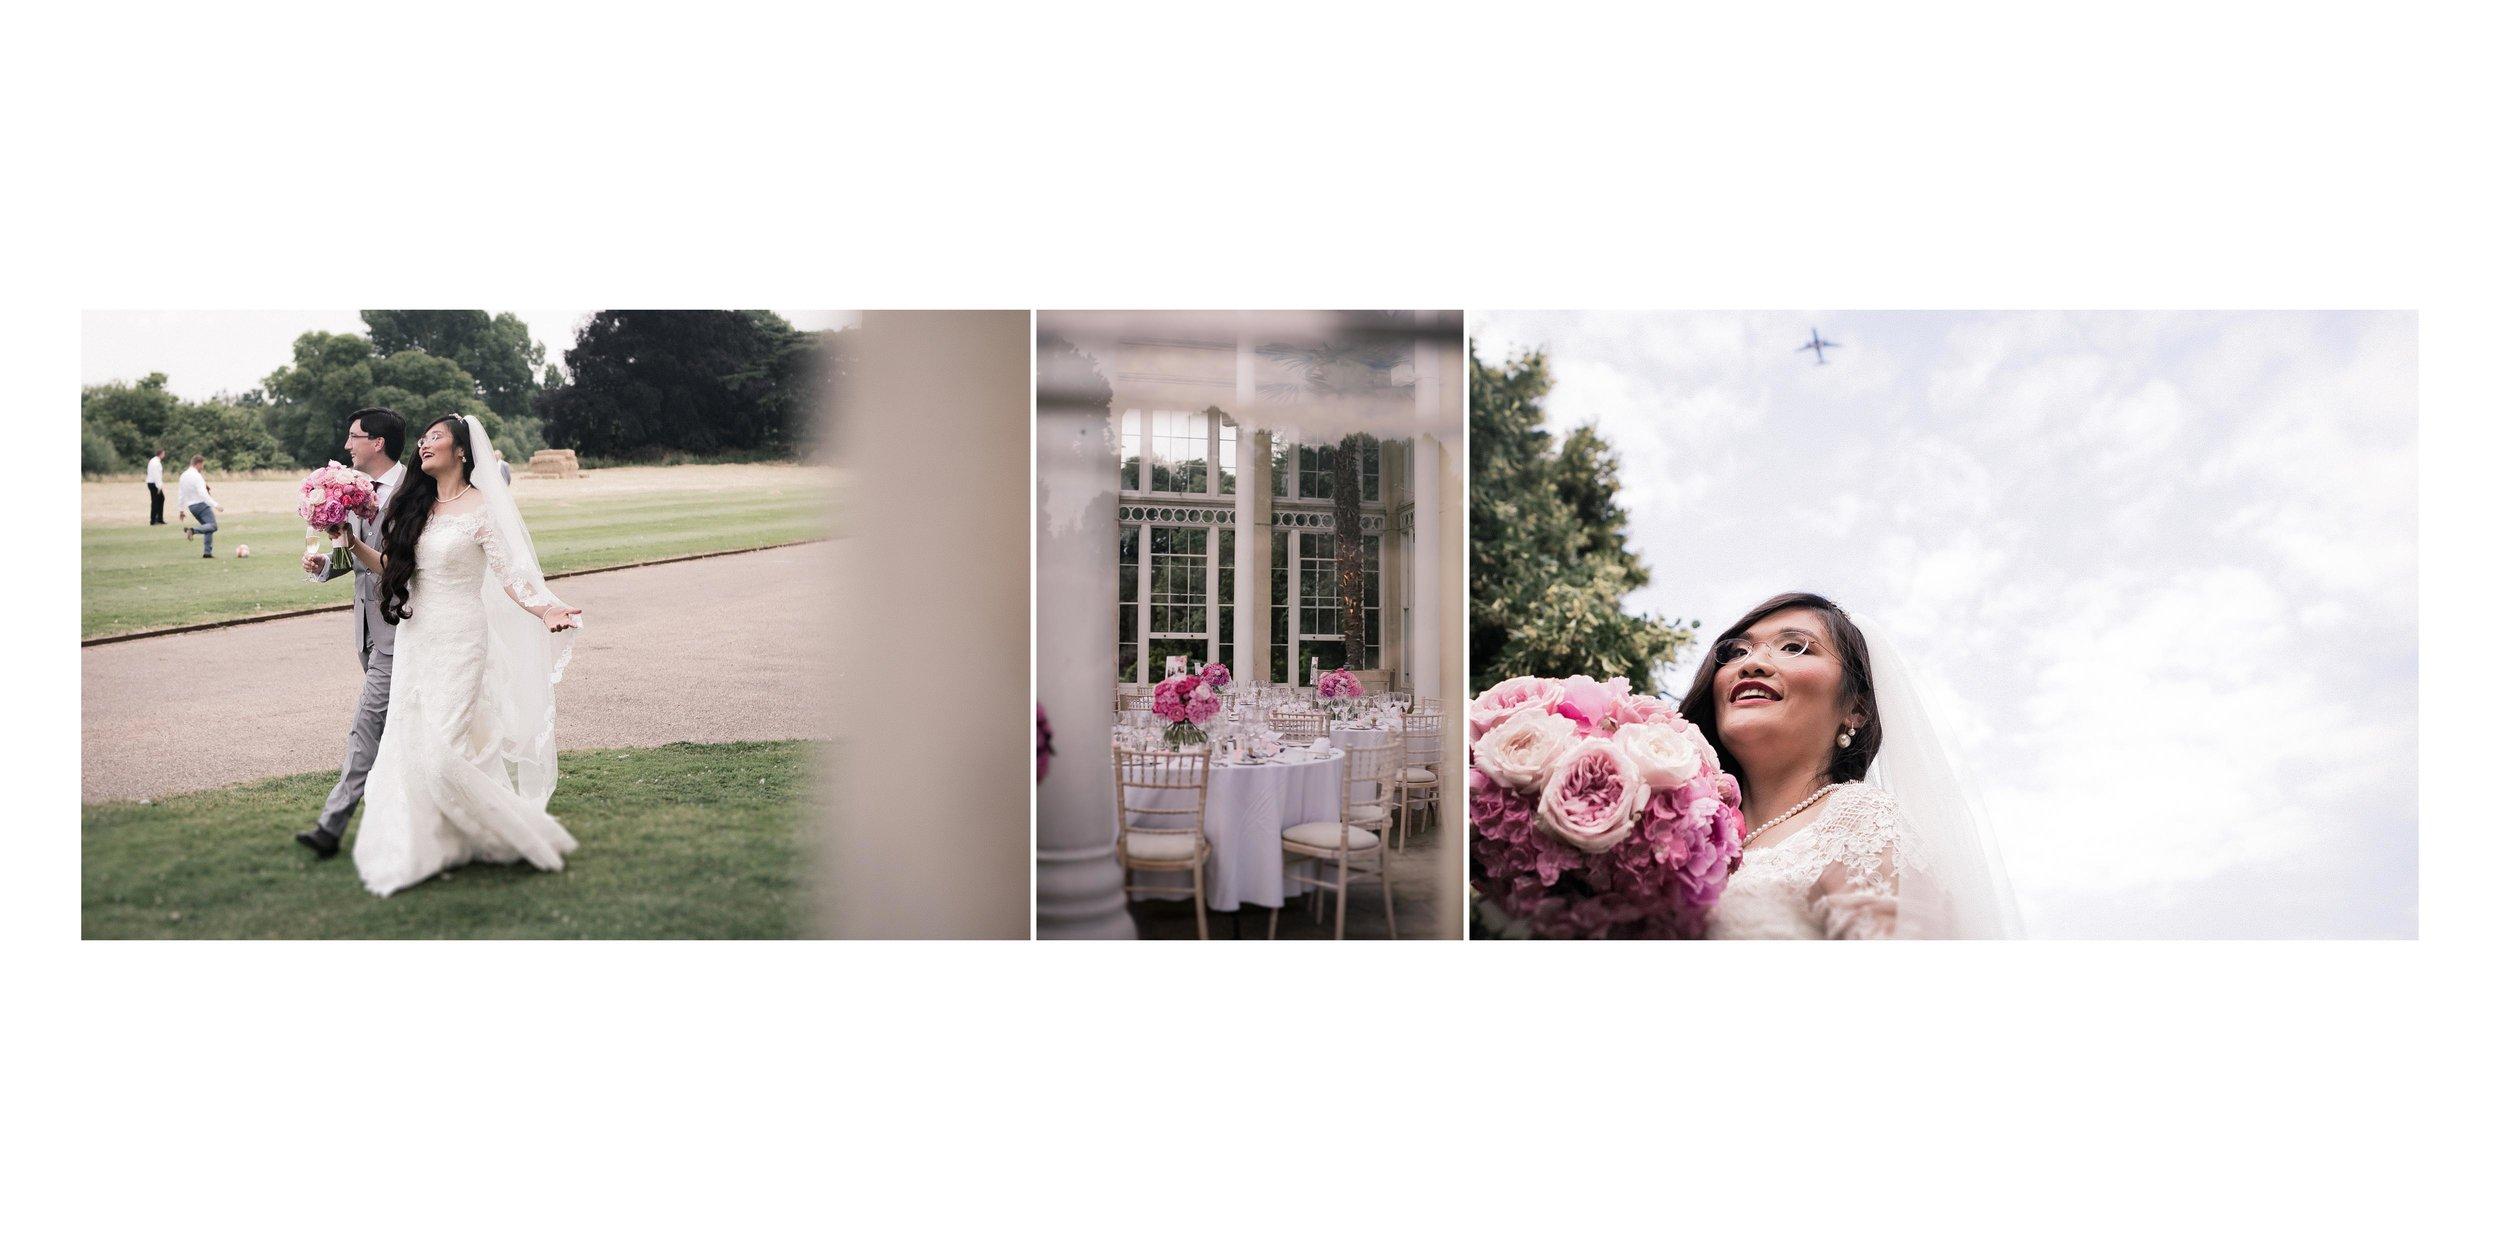 wedding_photographer_surrey_44.jpg